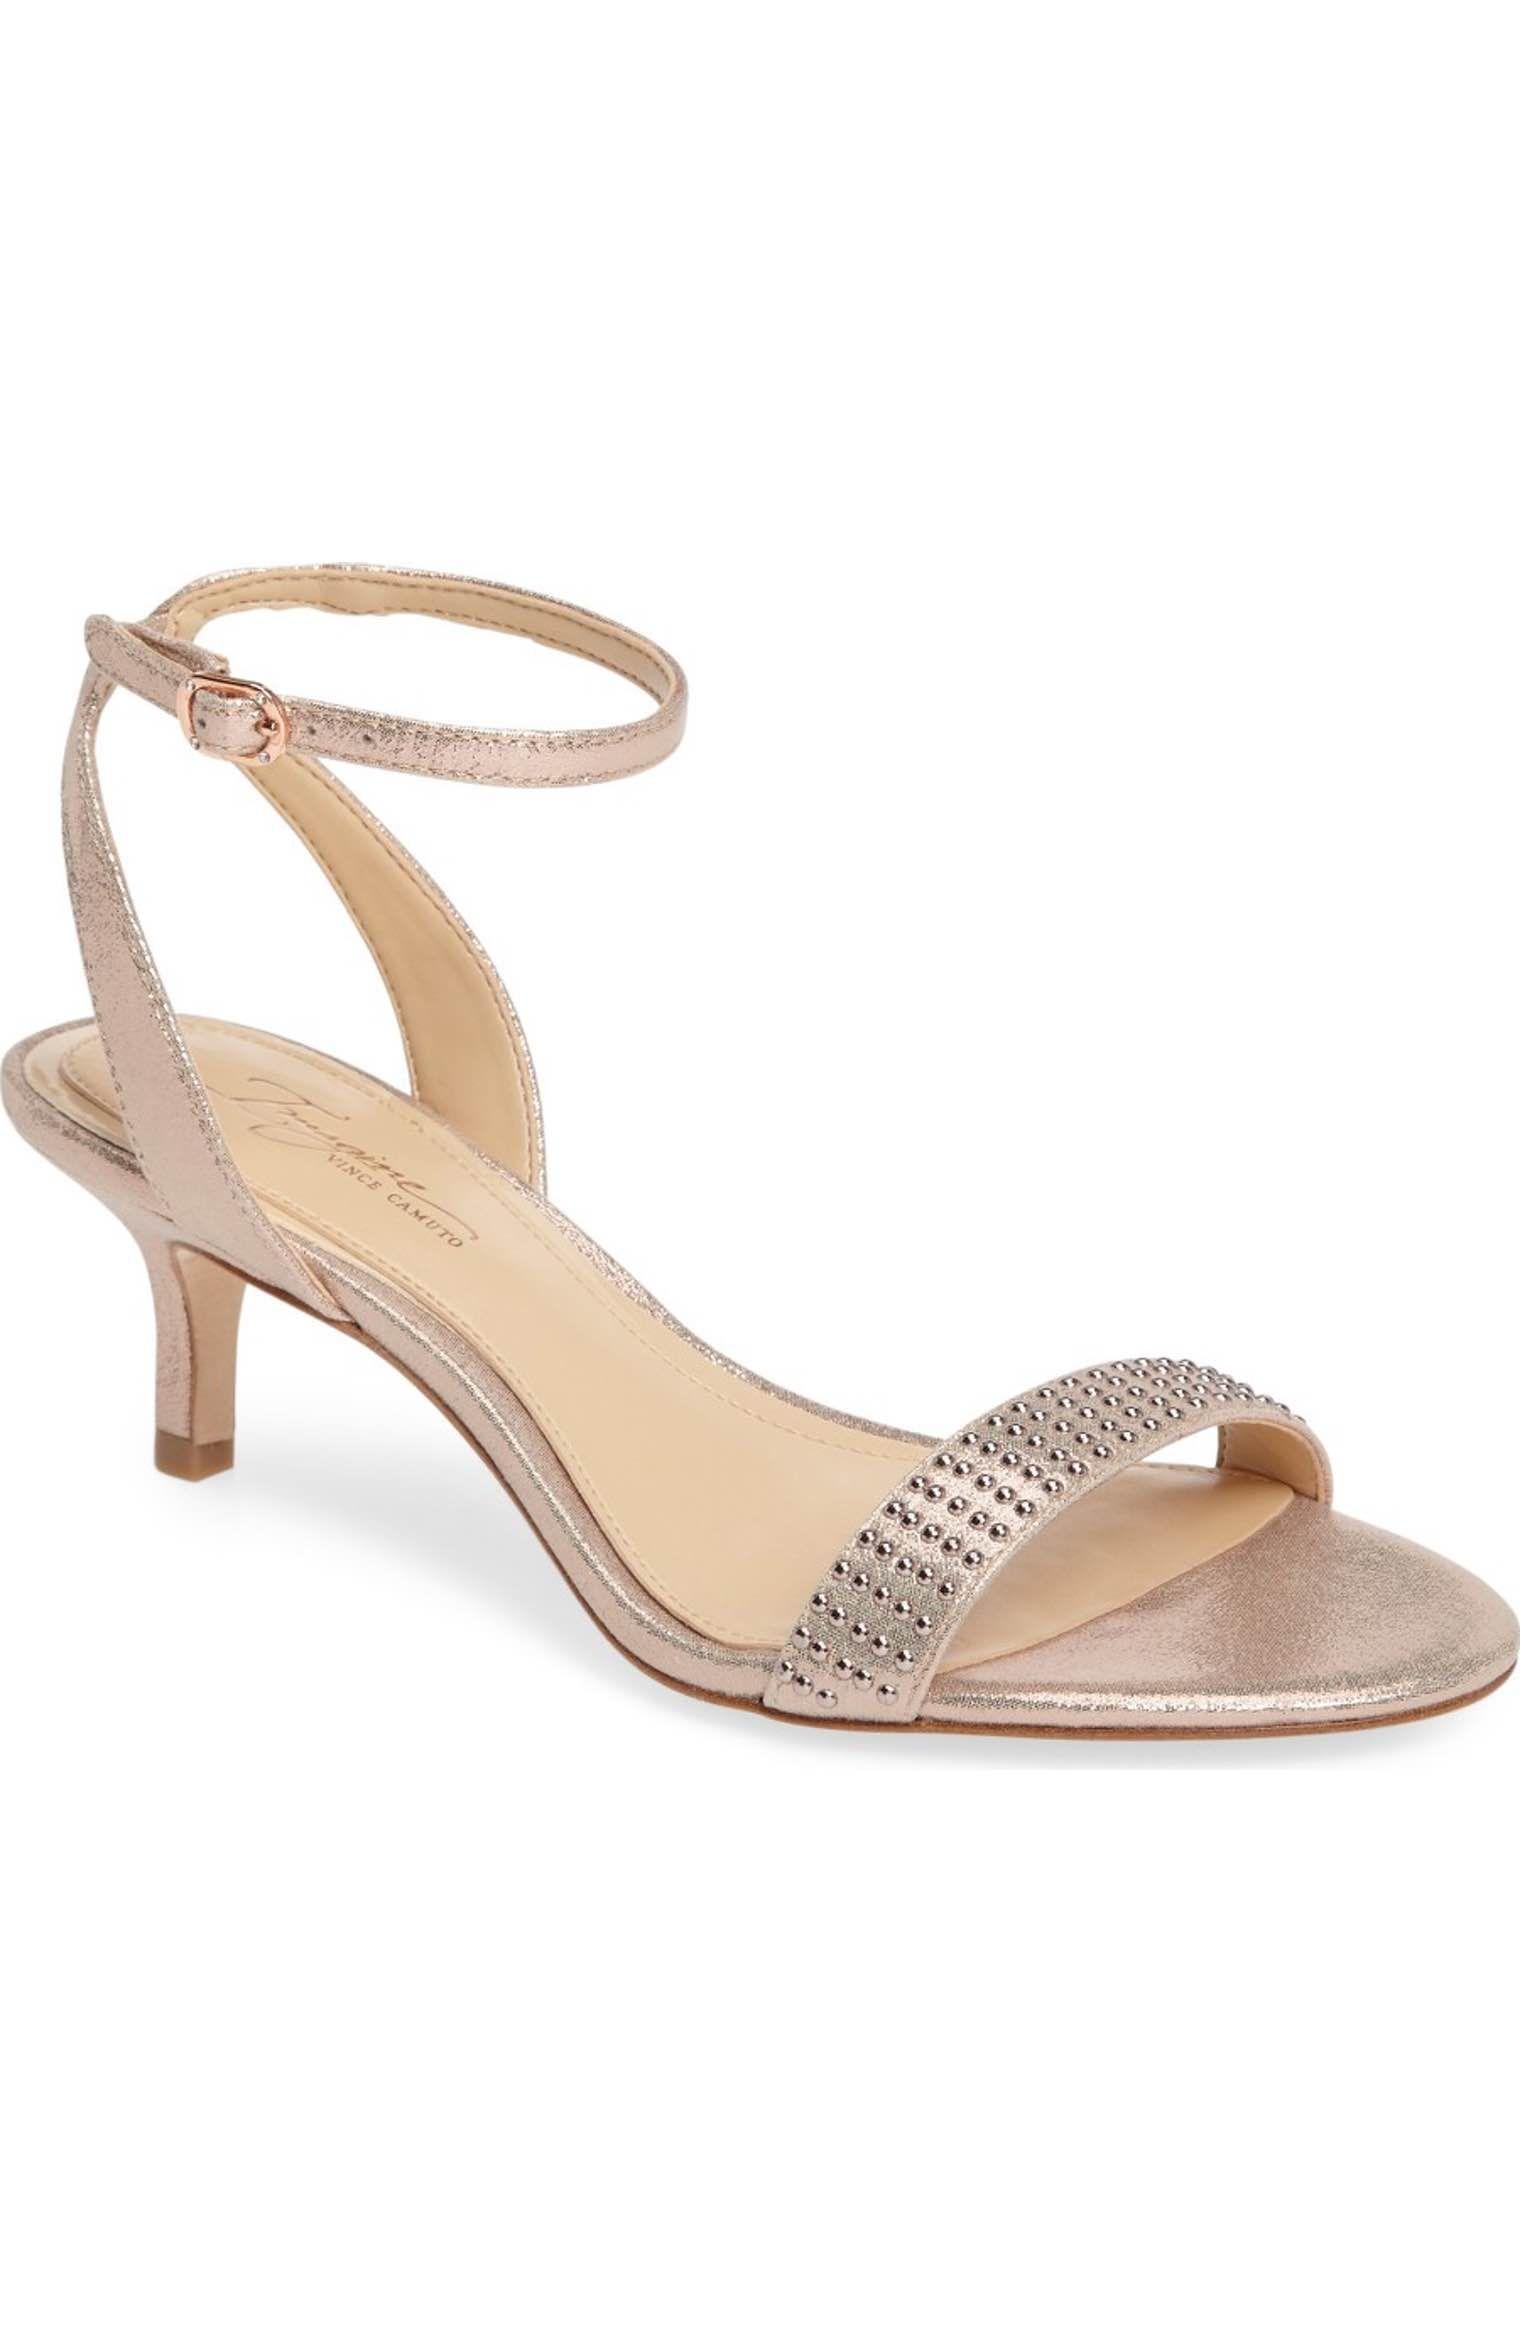 Imagine Vince Camuto Kevil Sandal Women Wedding Shoes Heels Kitten Heel Wedding Shoes Rose Gold Shoes